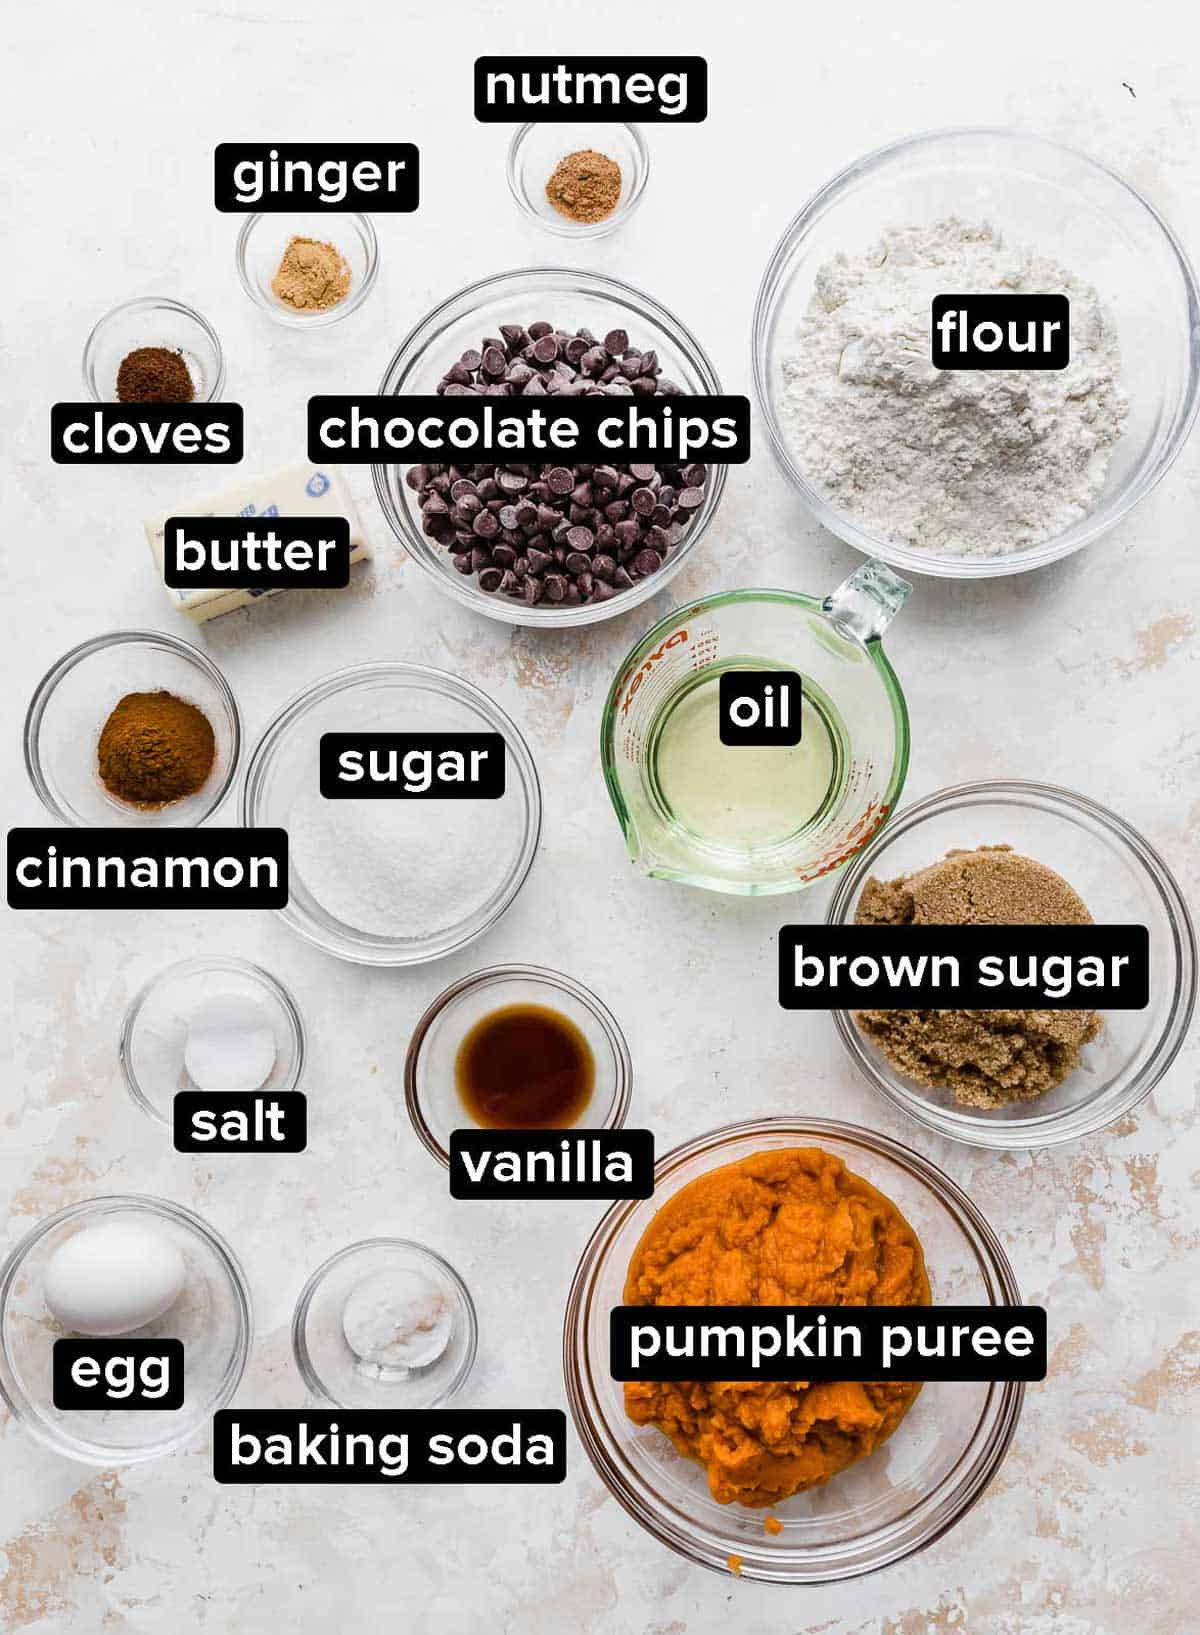 Pumpkin Chocolate Chip Coffee Cake ingredients on a cream textured background.